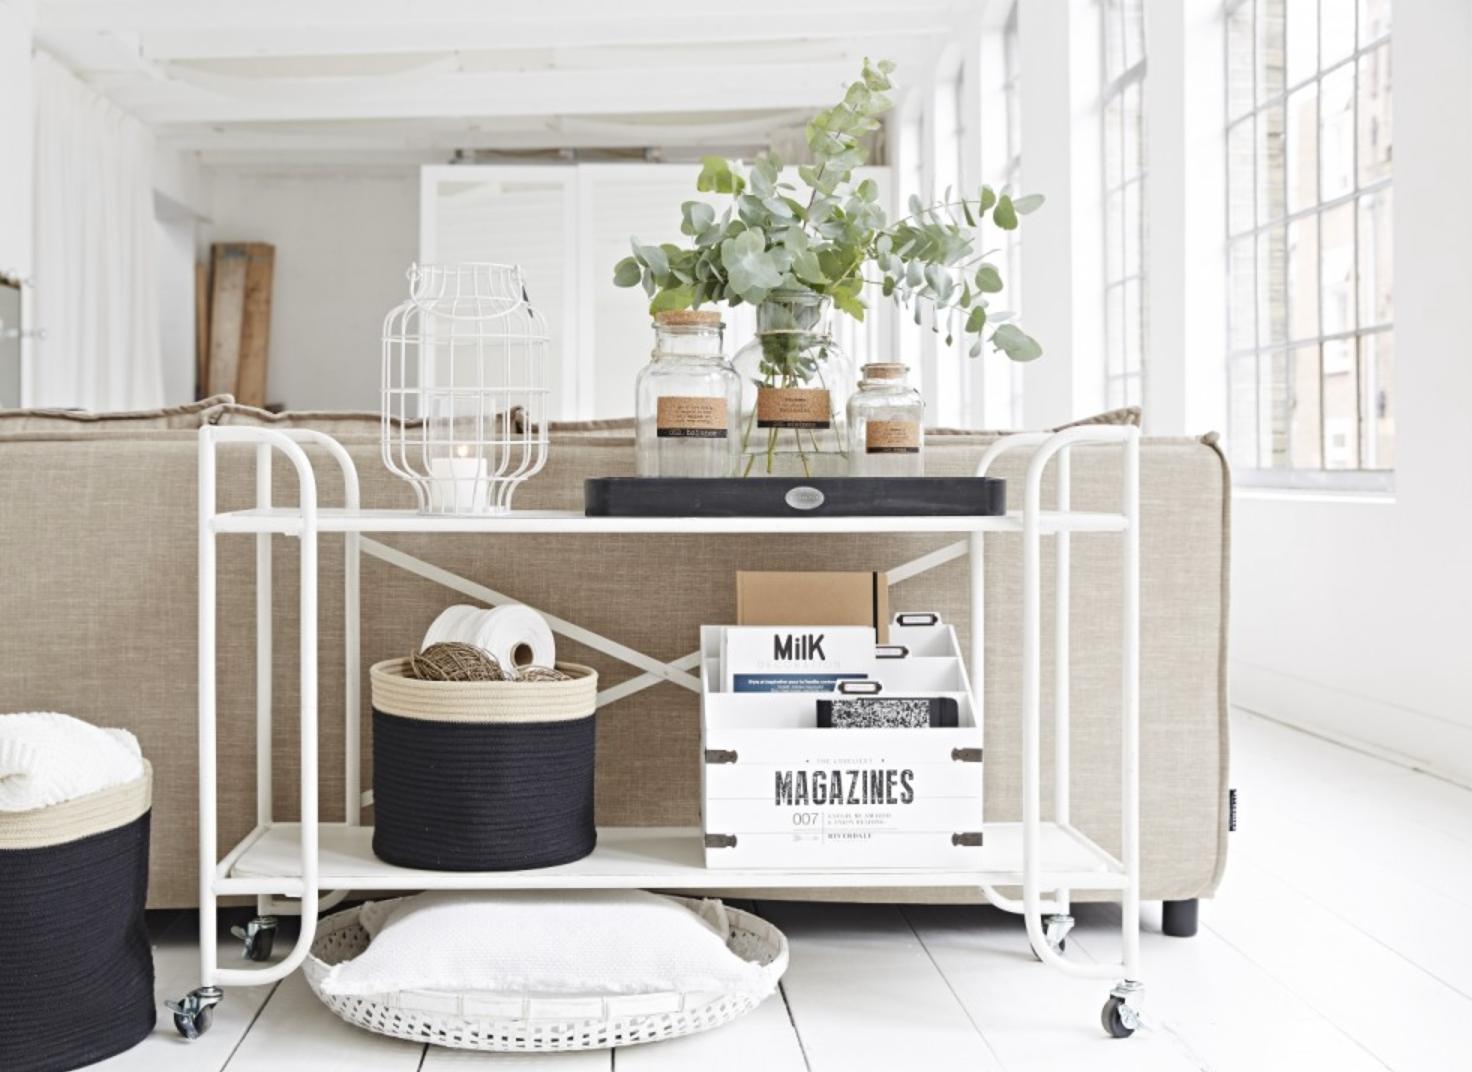 Lente archieven • stijlvol styling   woonblog •